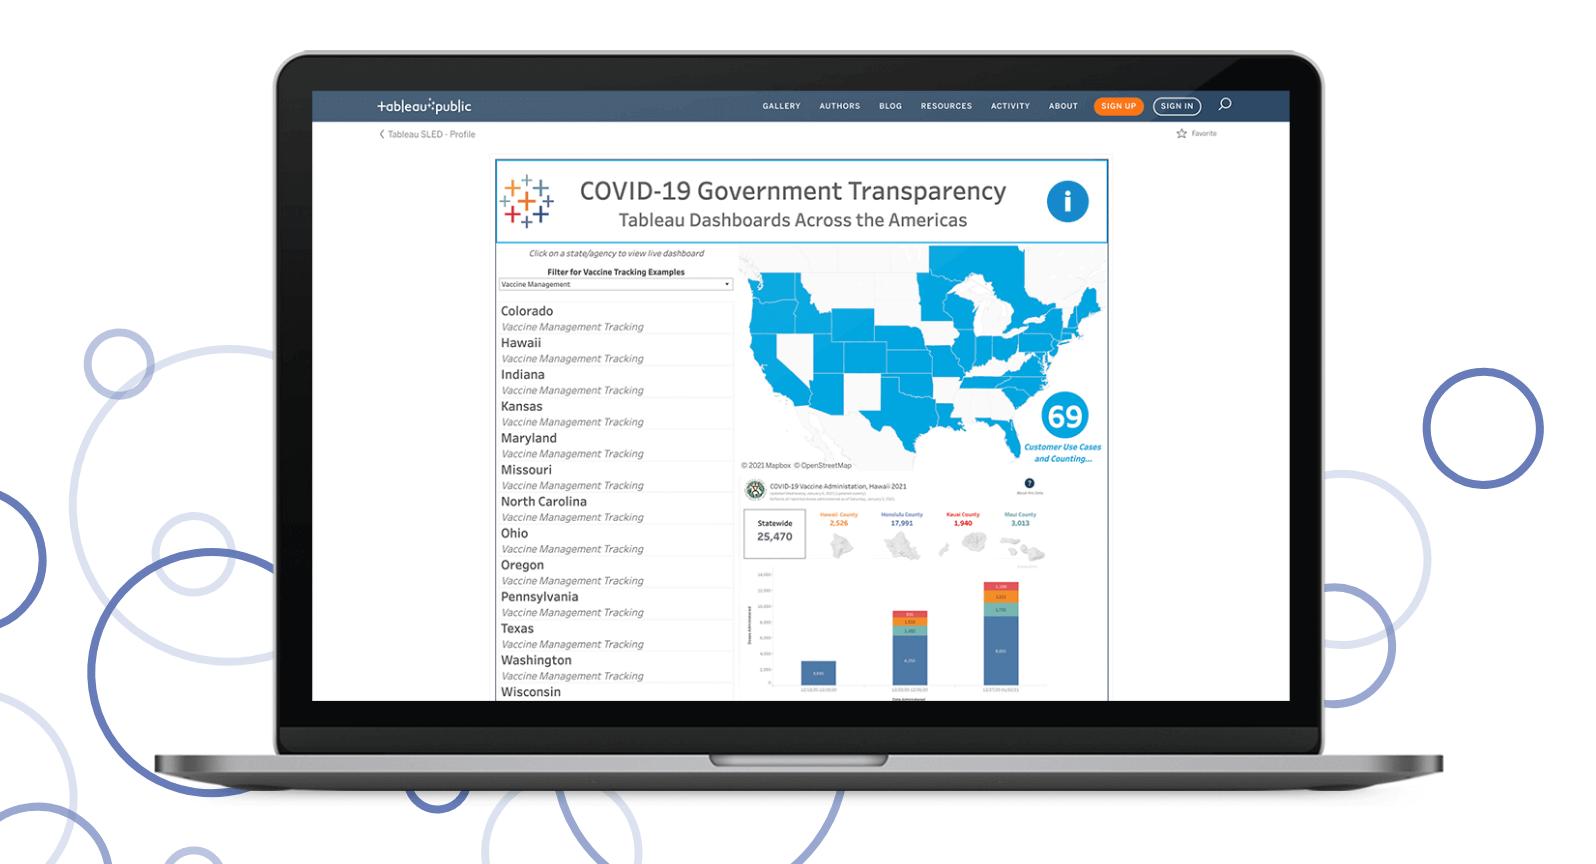 COVID-19 Transparency Dashboard